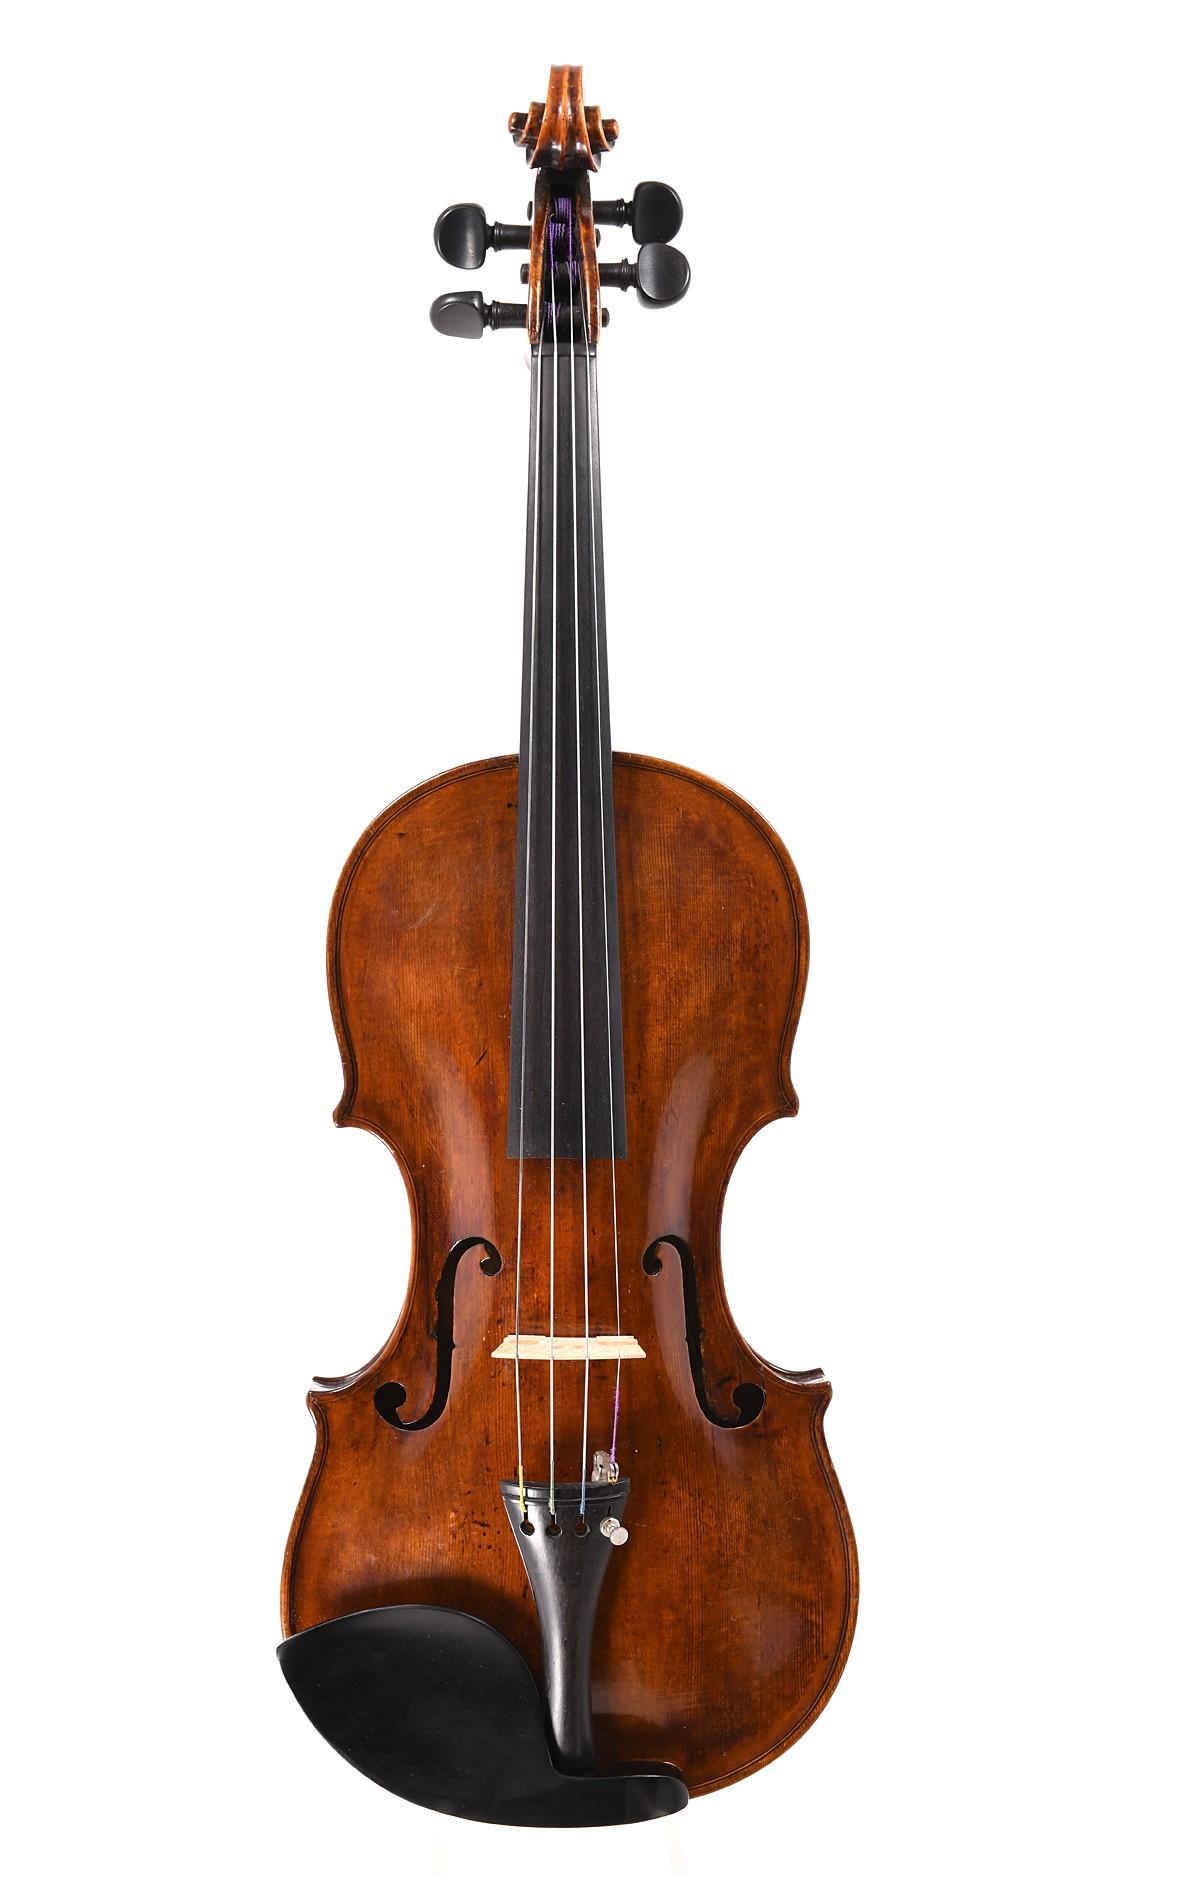 Interesting  Vogtland master violin, approx. 1770 - table